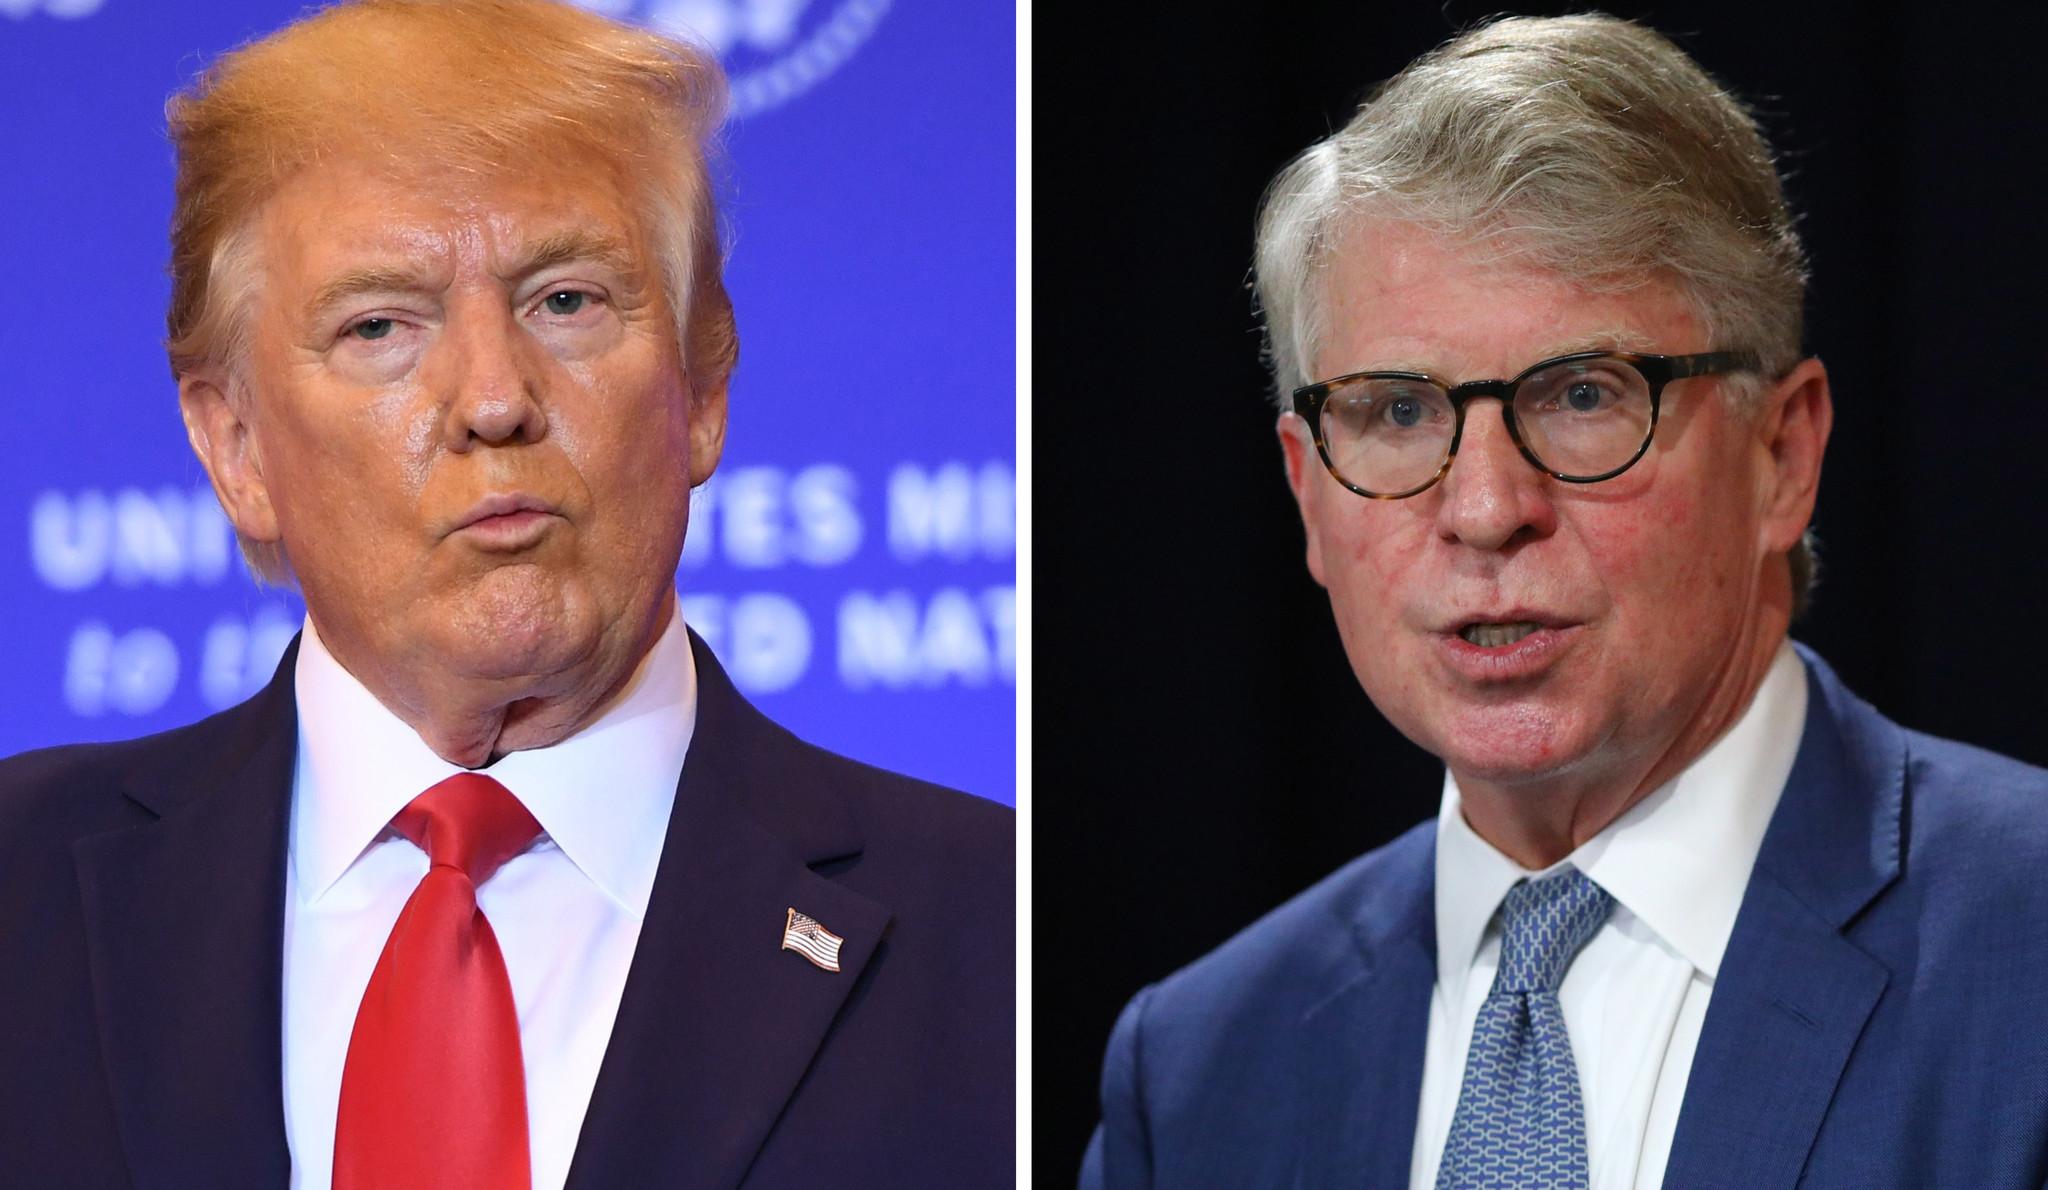 Trump and DA Cy Vance reach deal while awaiting ruling on tax returns